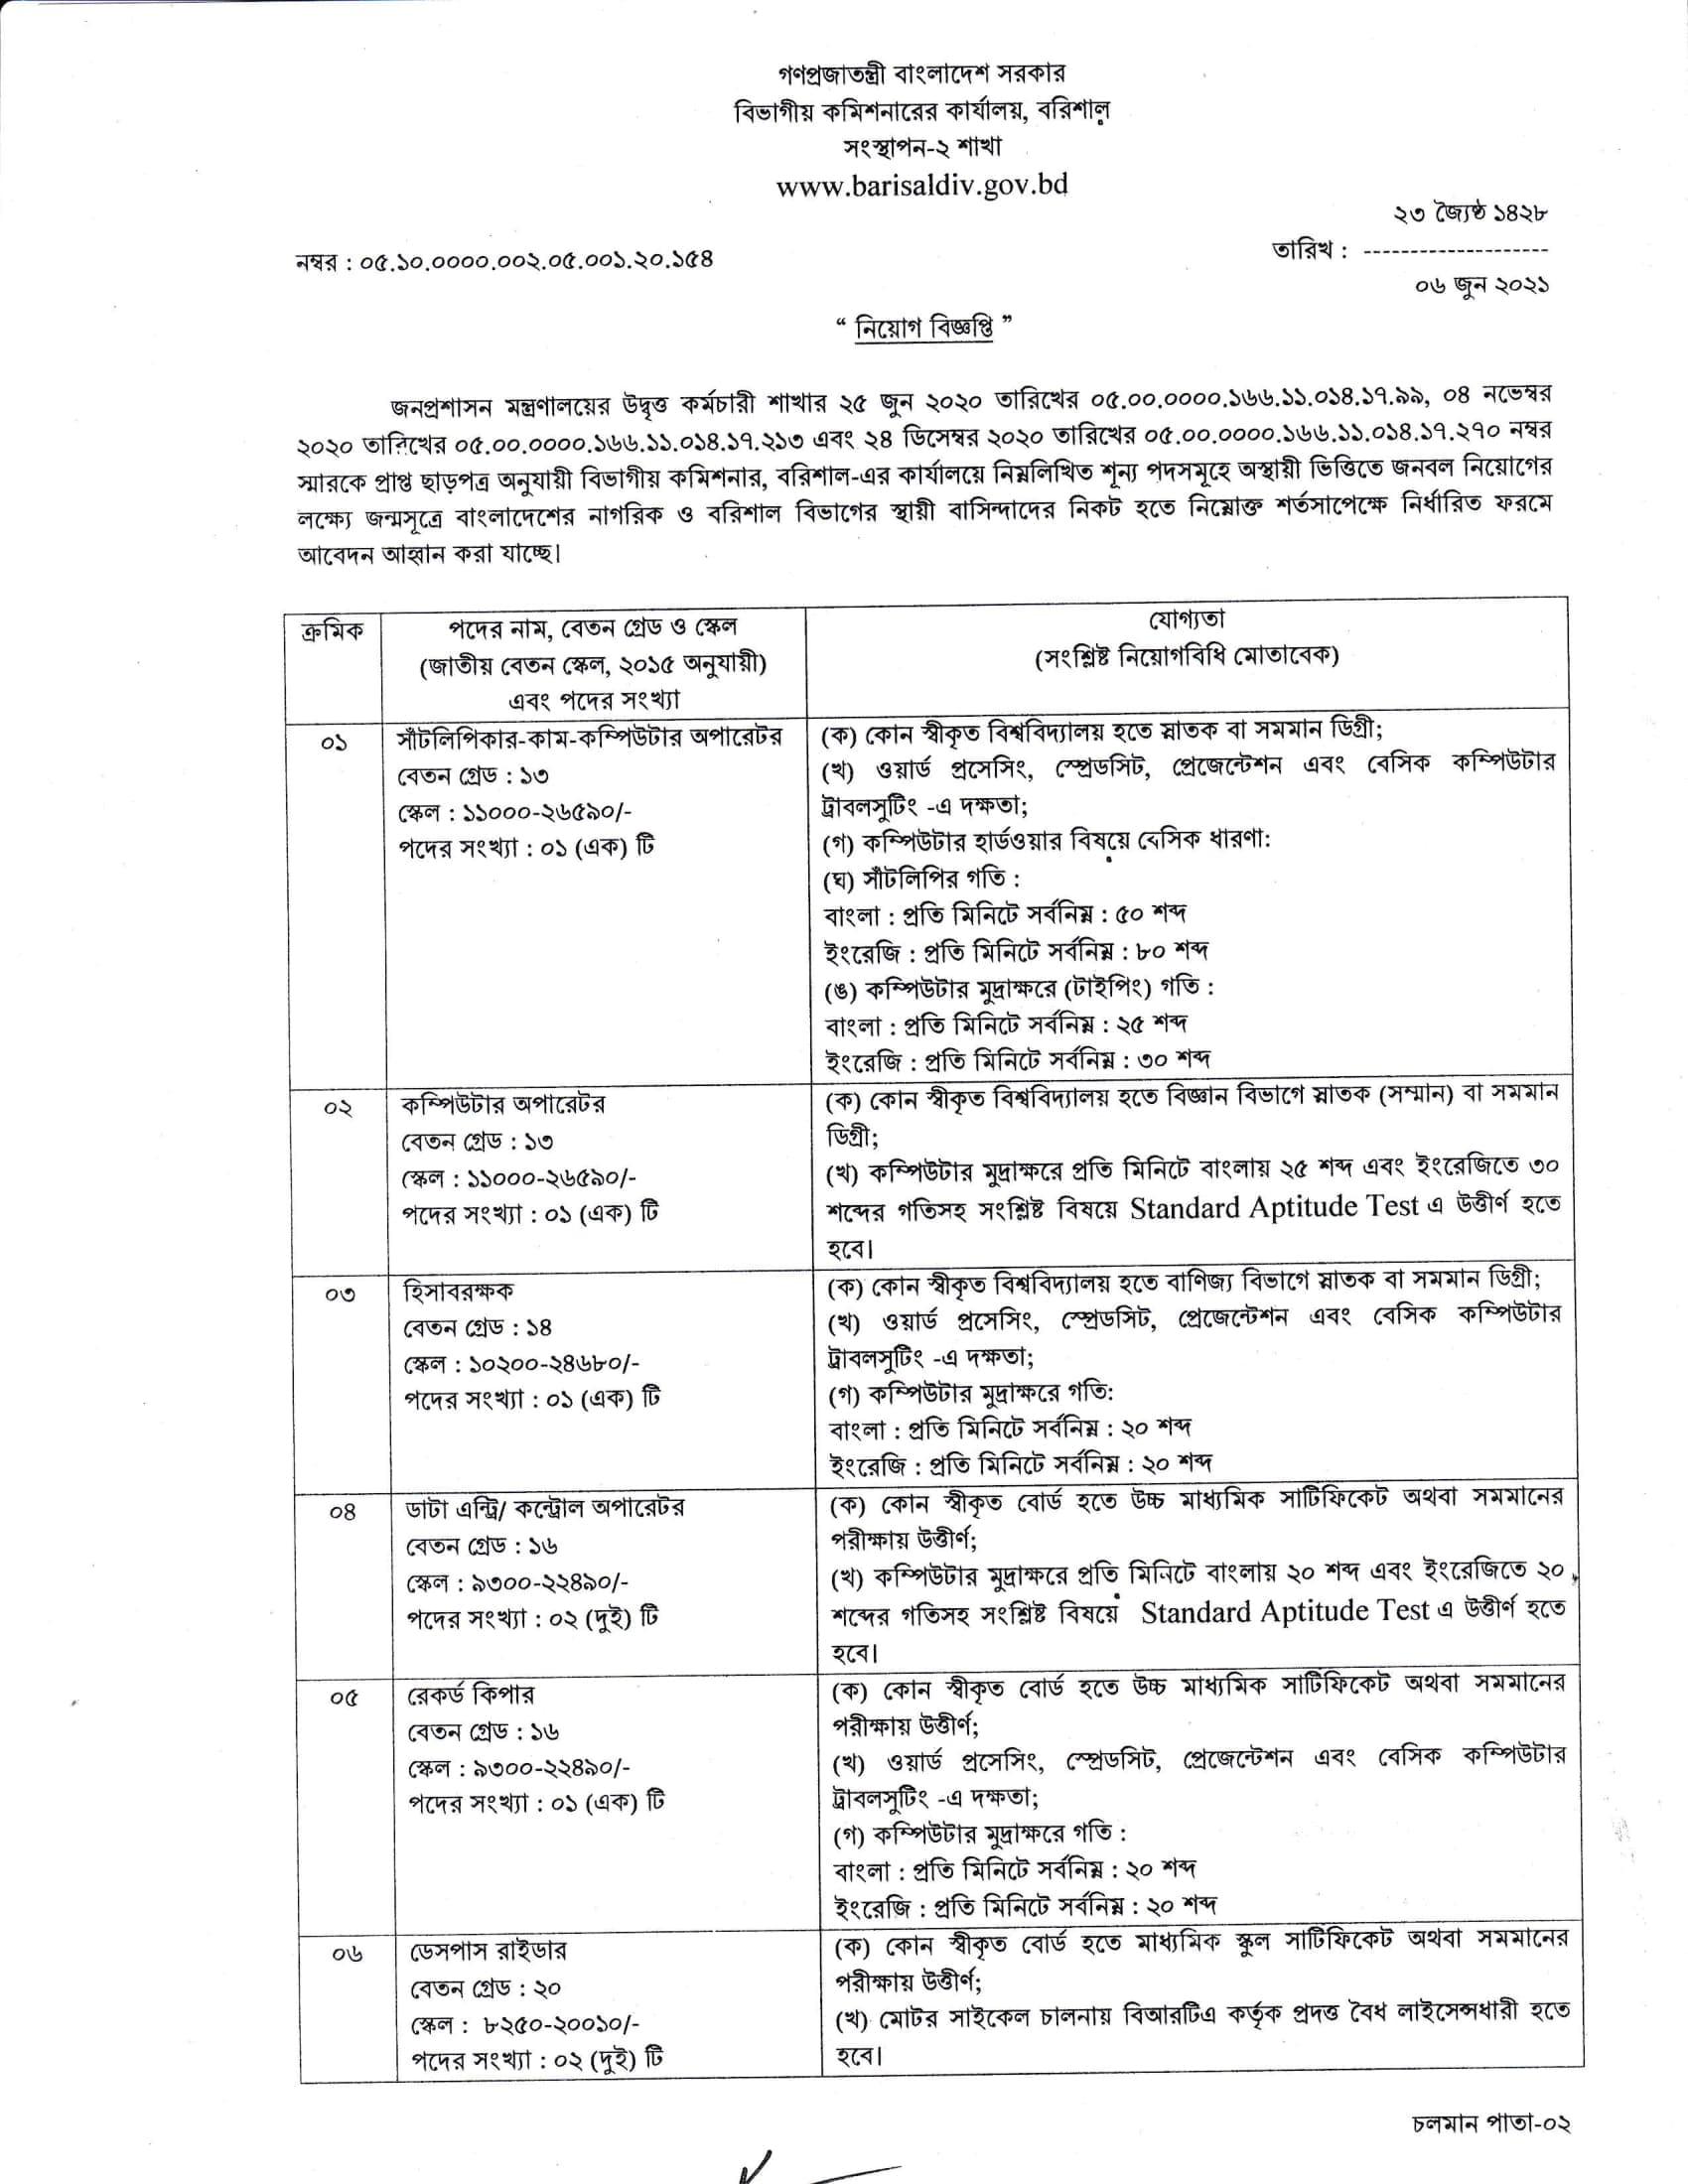 Barisal Divisional Commissioners Office Job Circular 2021